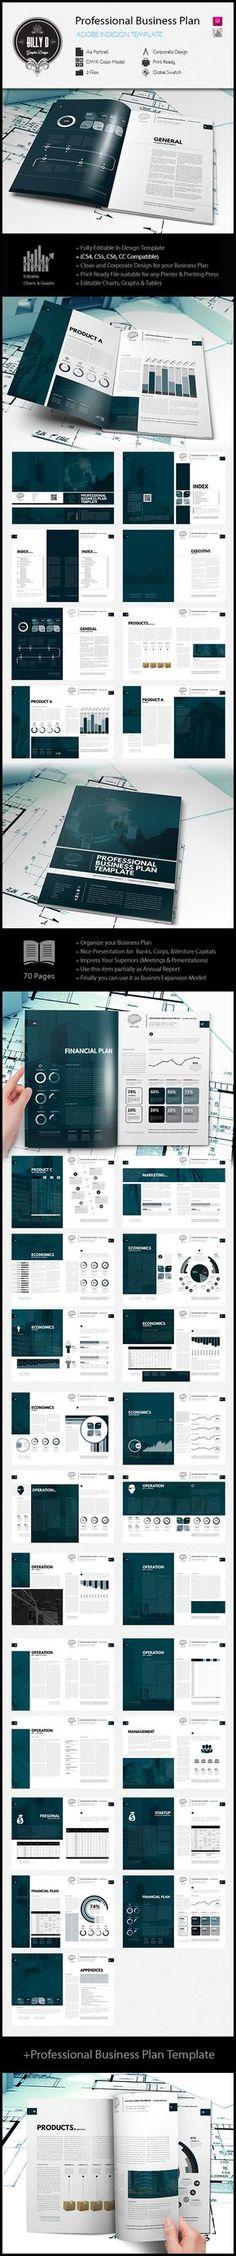 How to Write an Executive Summary Executive summary, Business - an executive summary